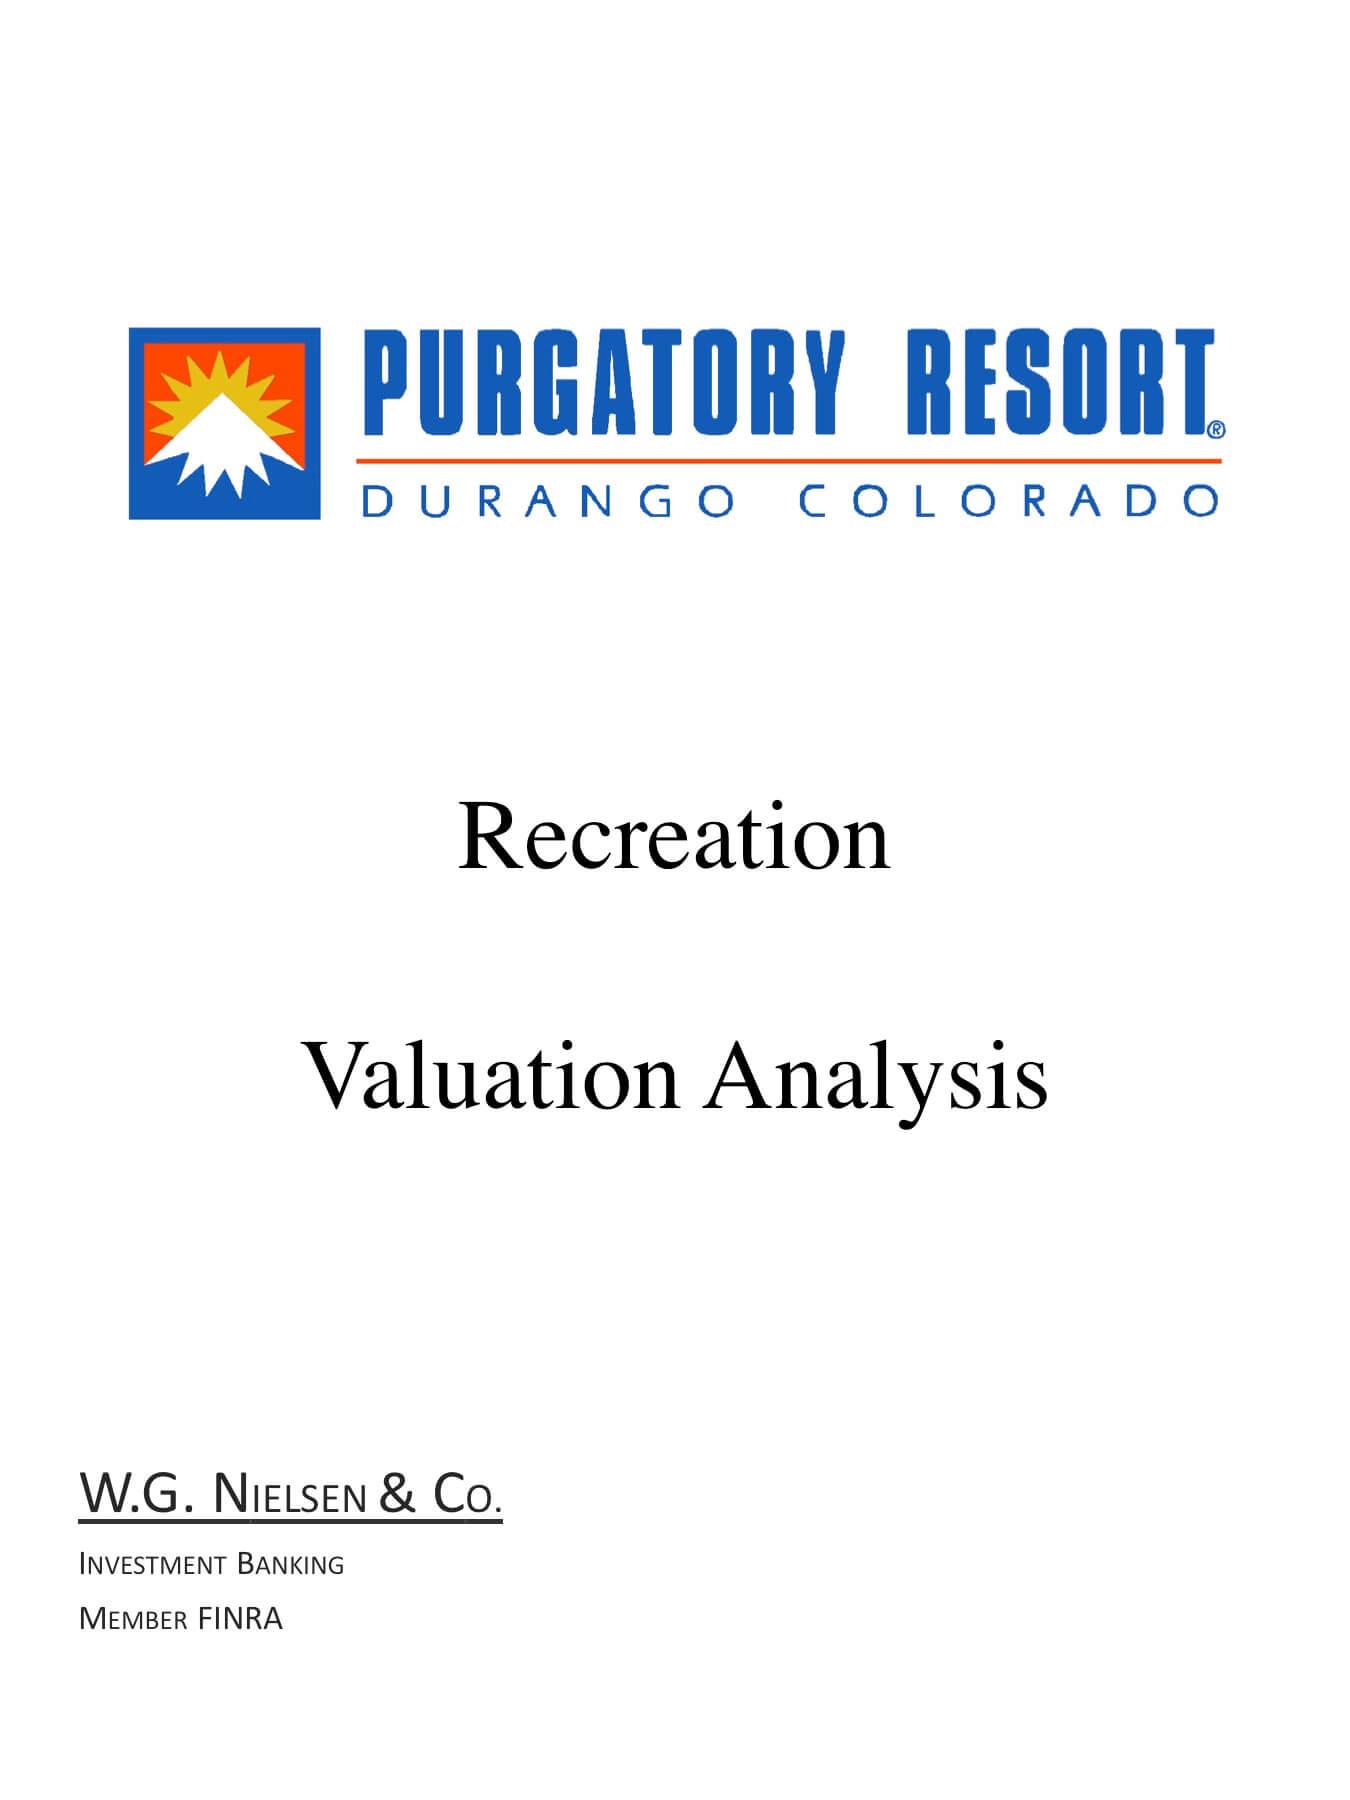 purgatory resort investment banking transaction